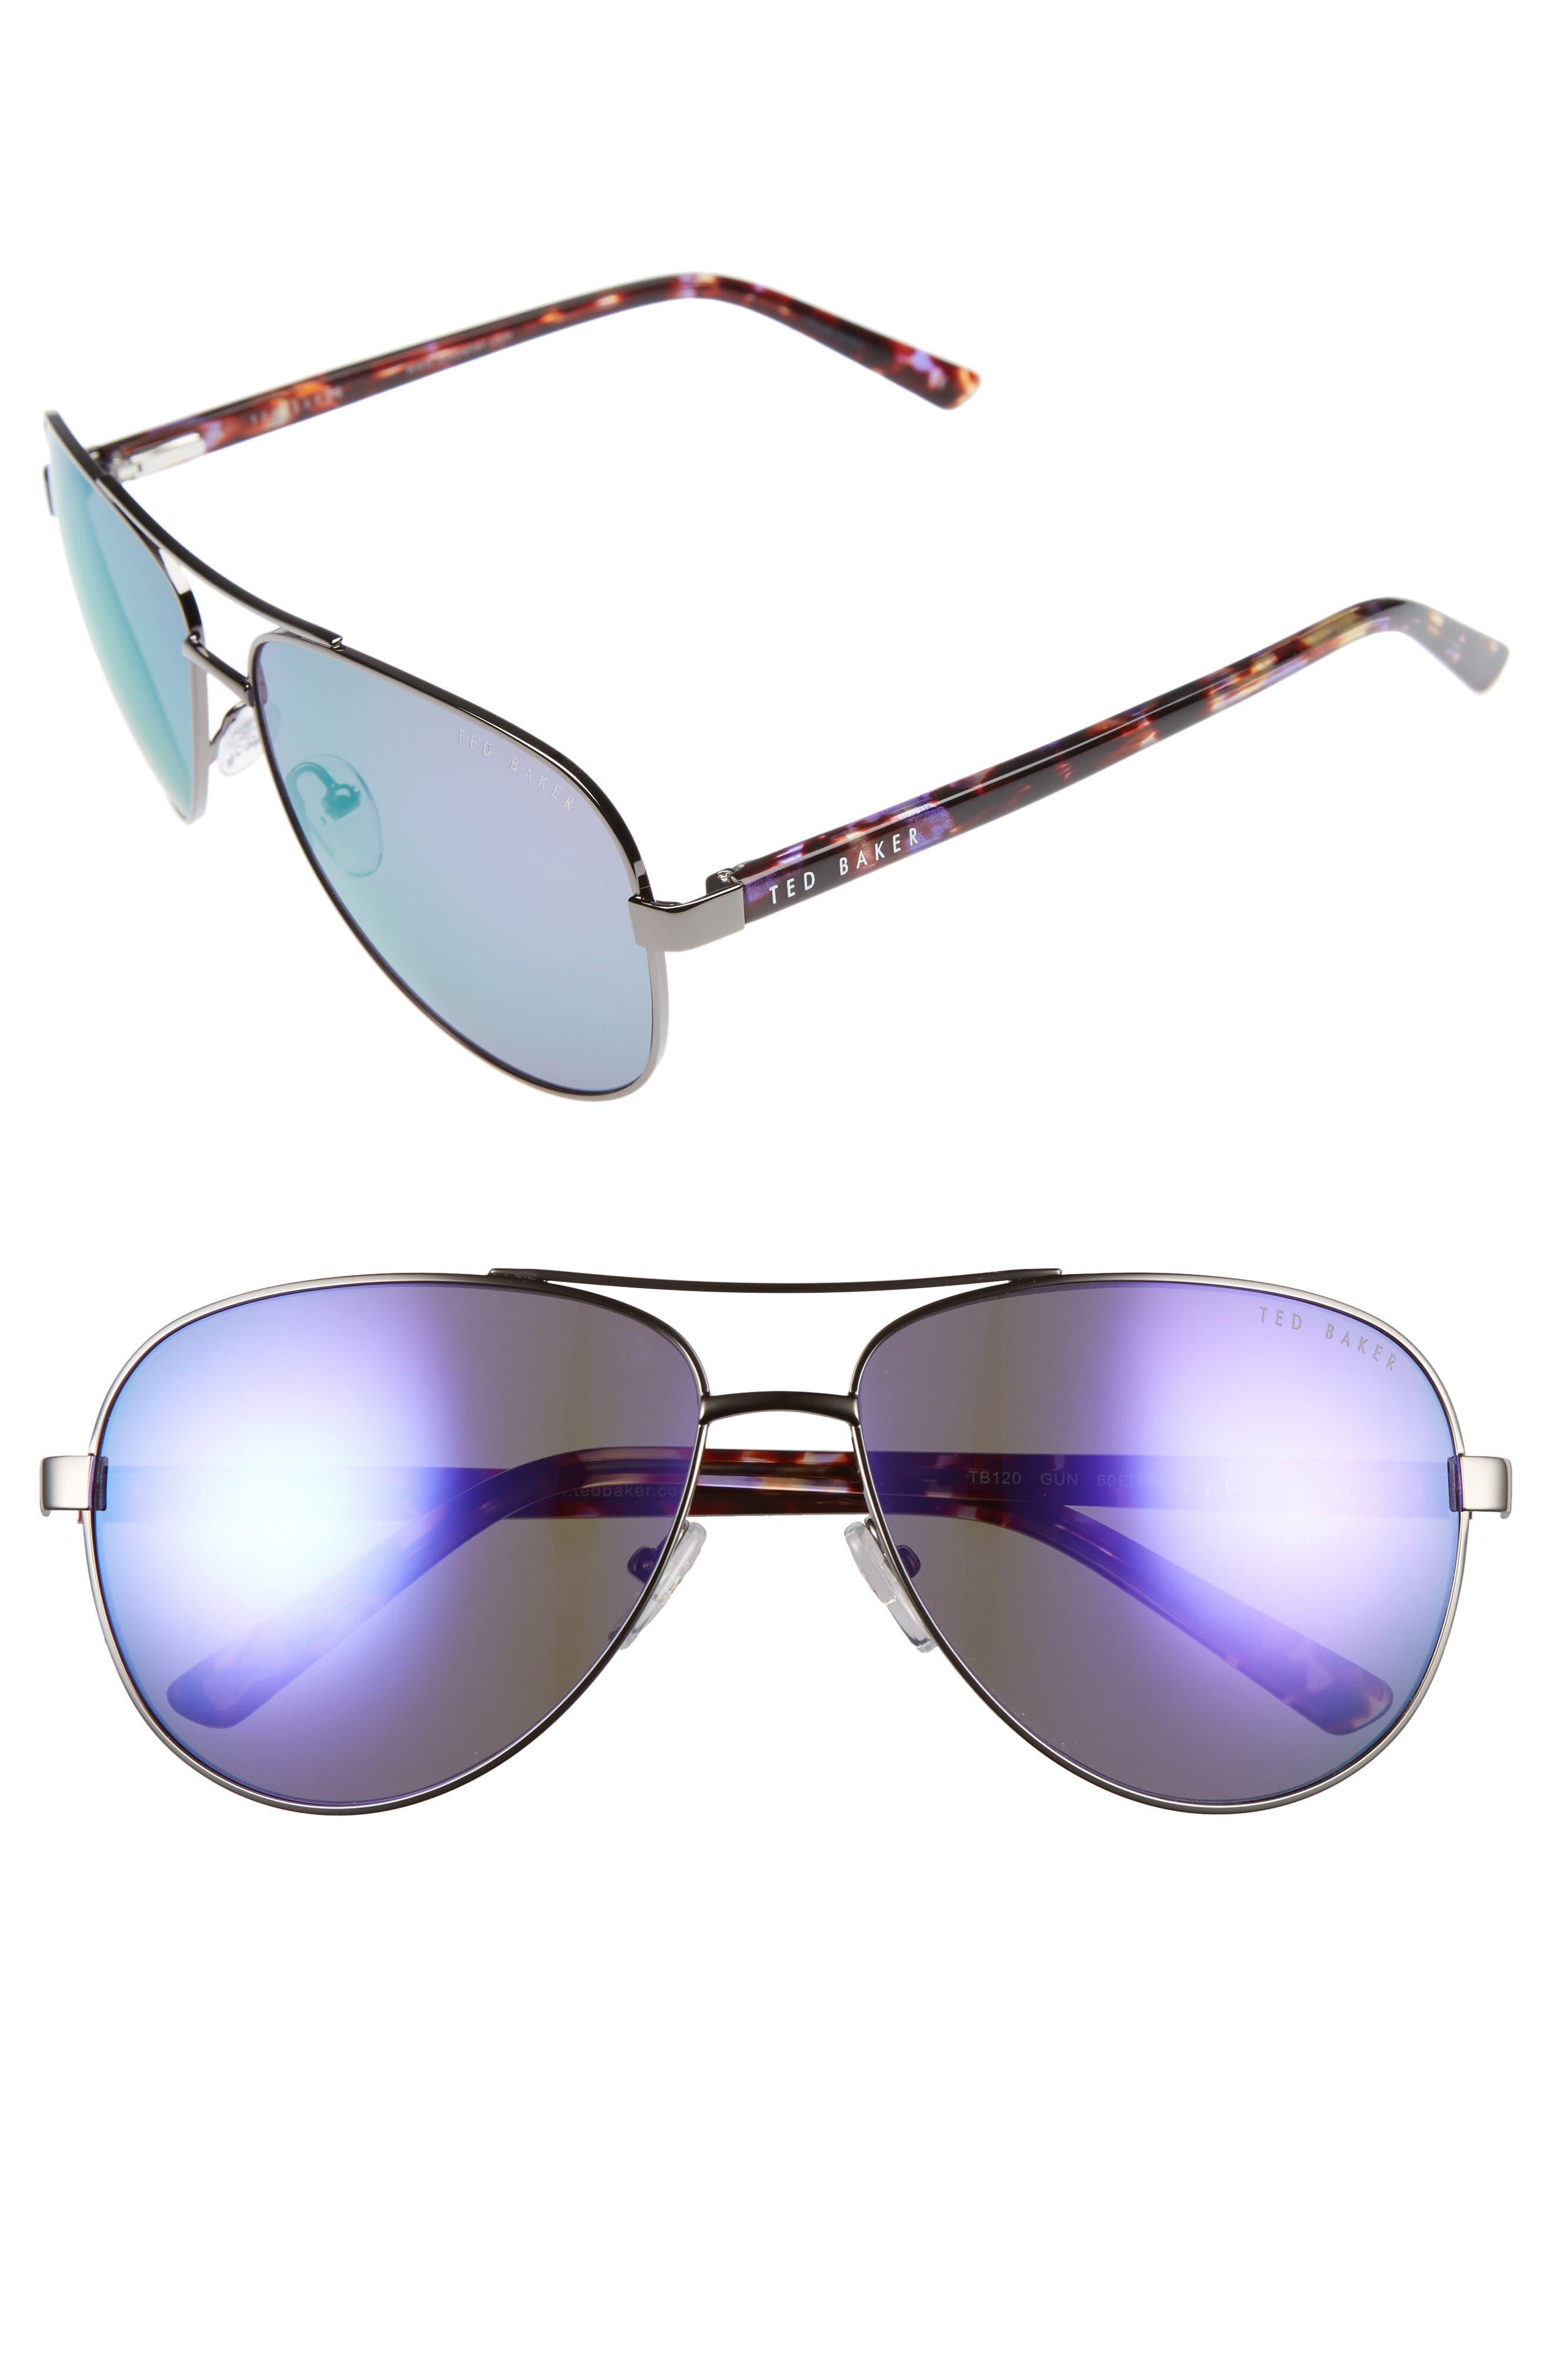 60mm Aviator Sunglasses,                         Main,                         color, Gunmetal